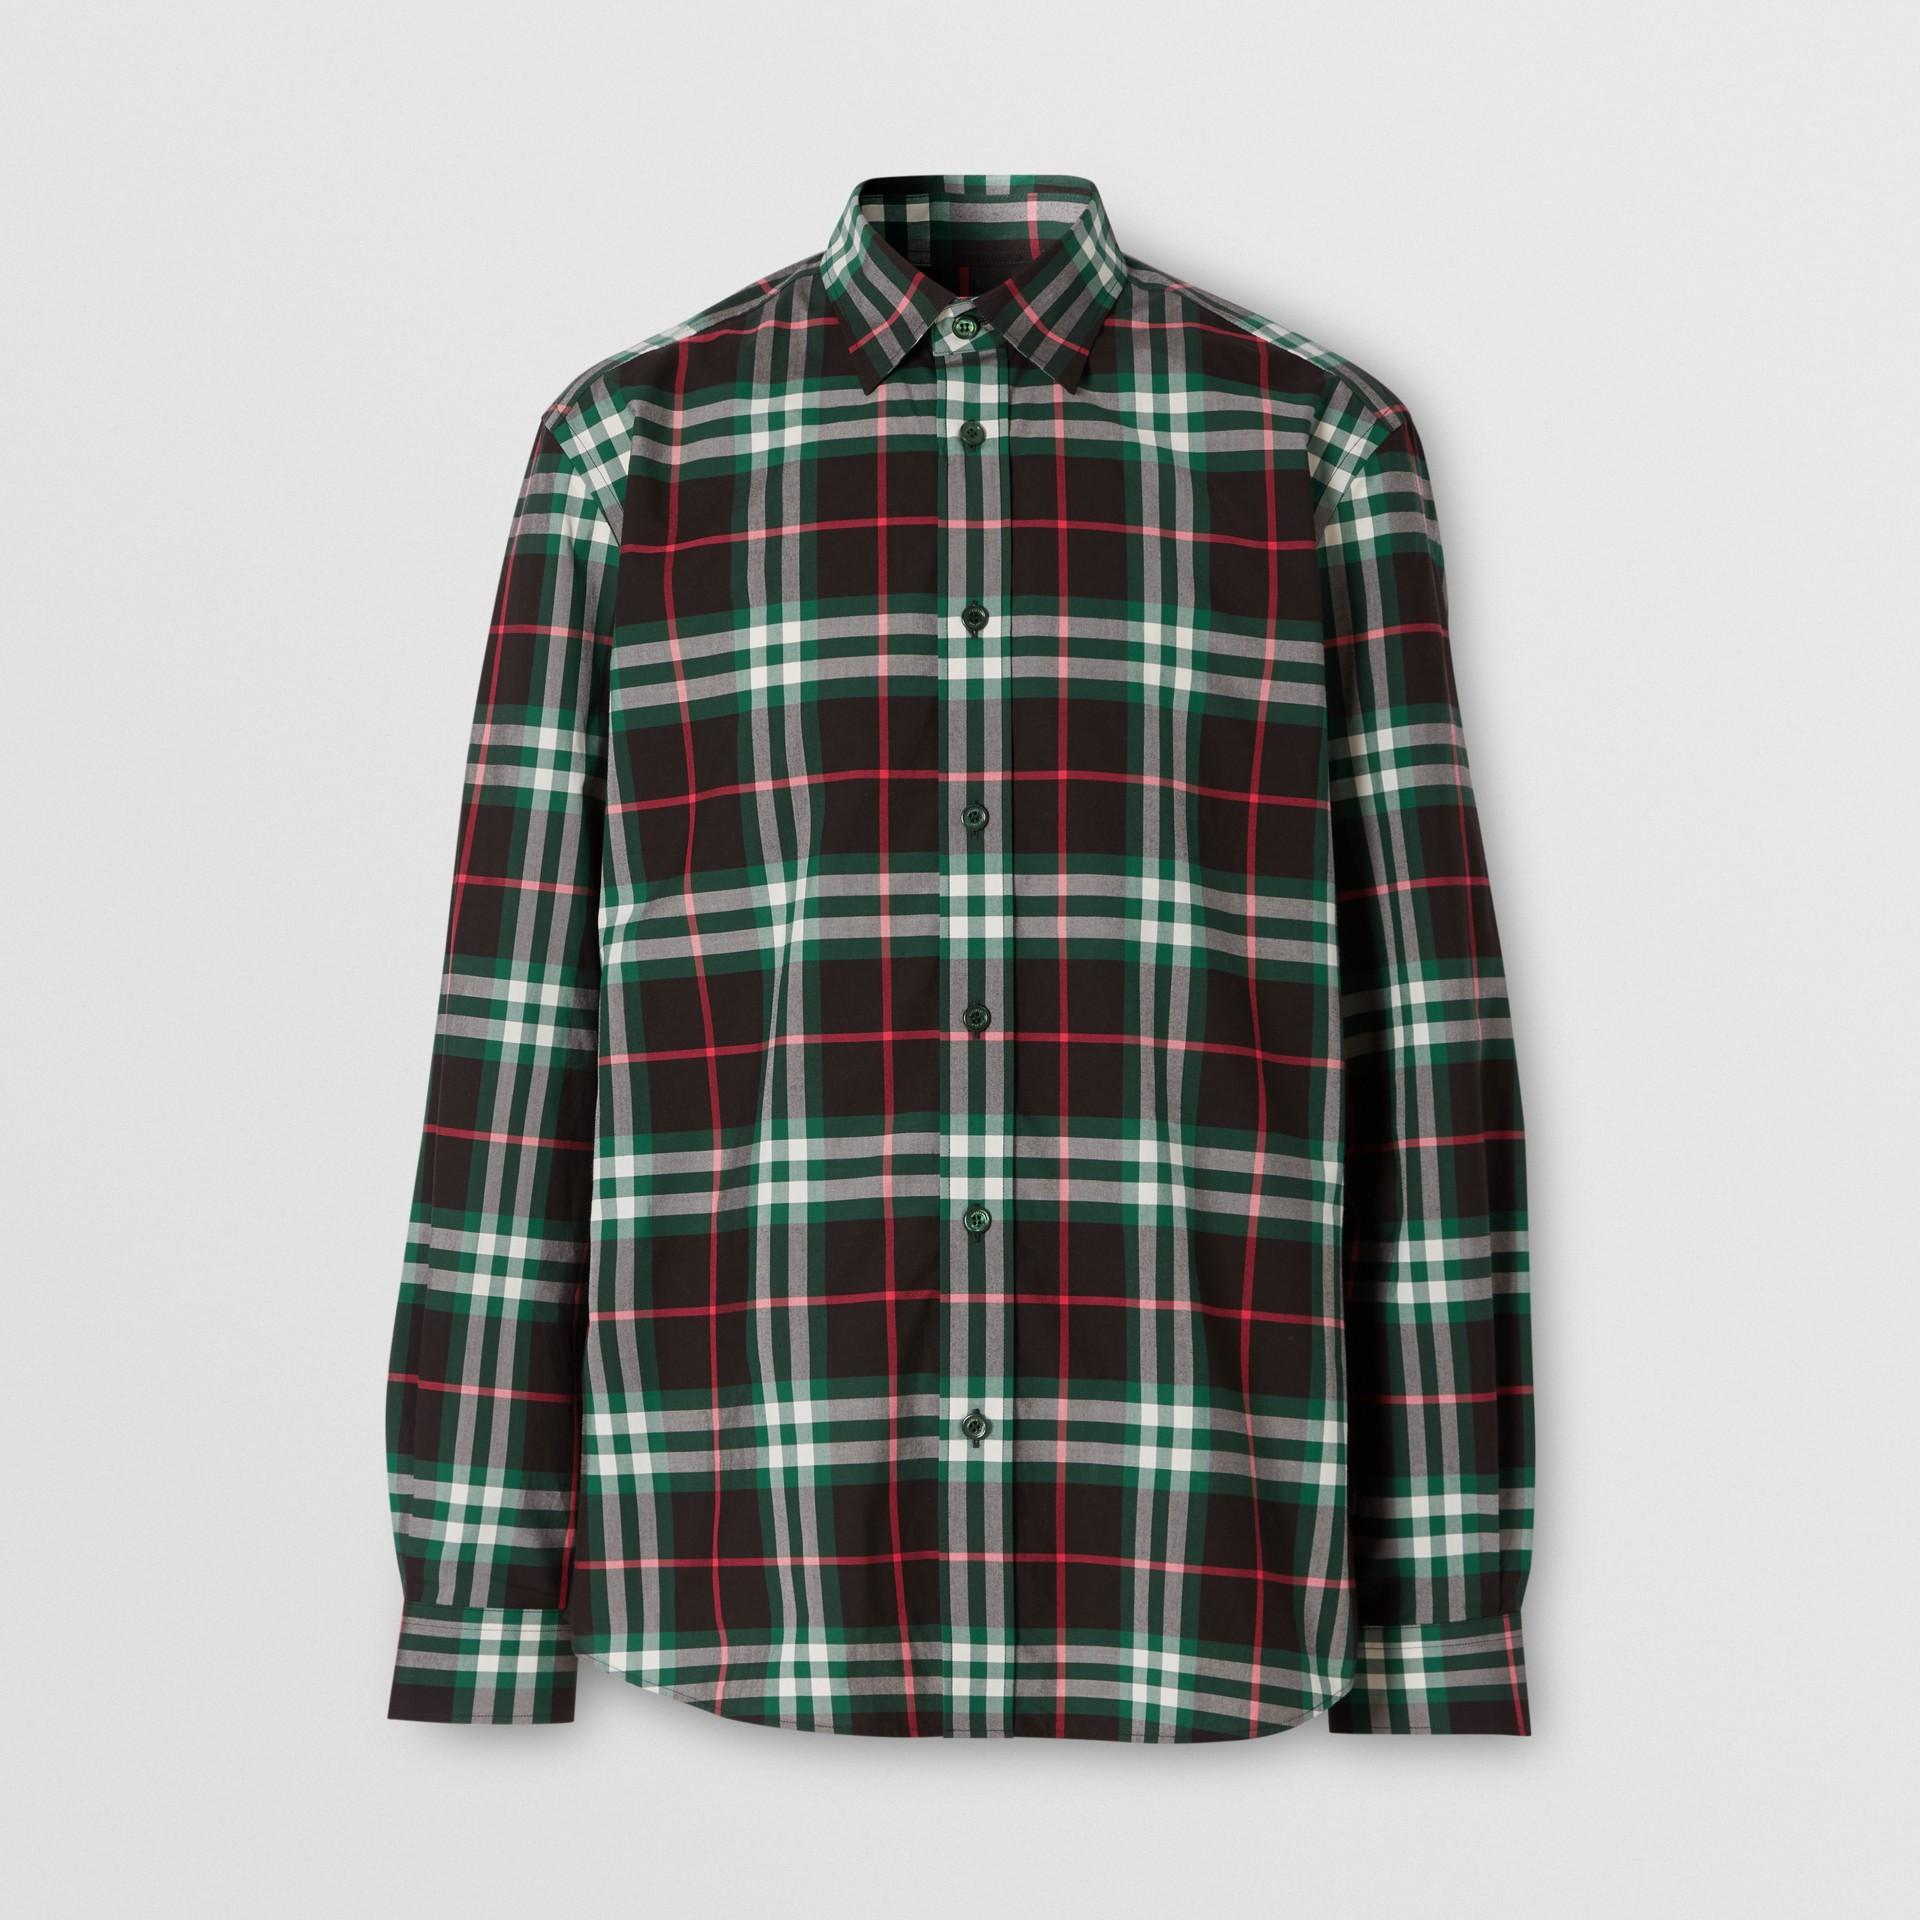 Check Cotton Poplin Shirt in Viridian Green - Men | Burberry - gallery image 3